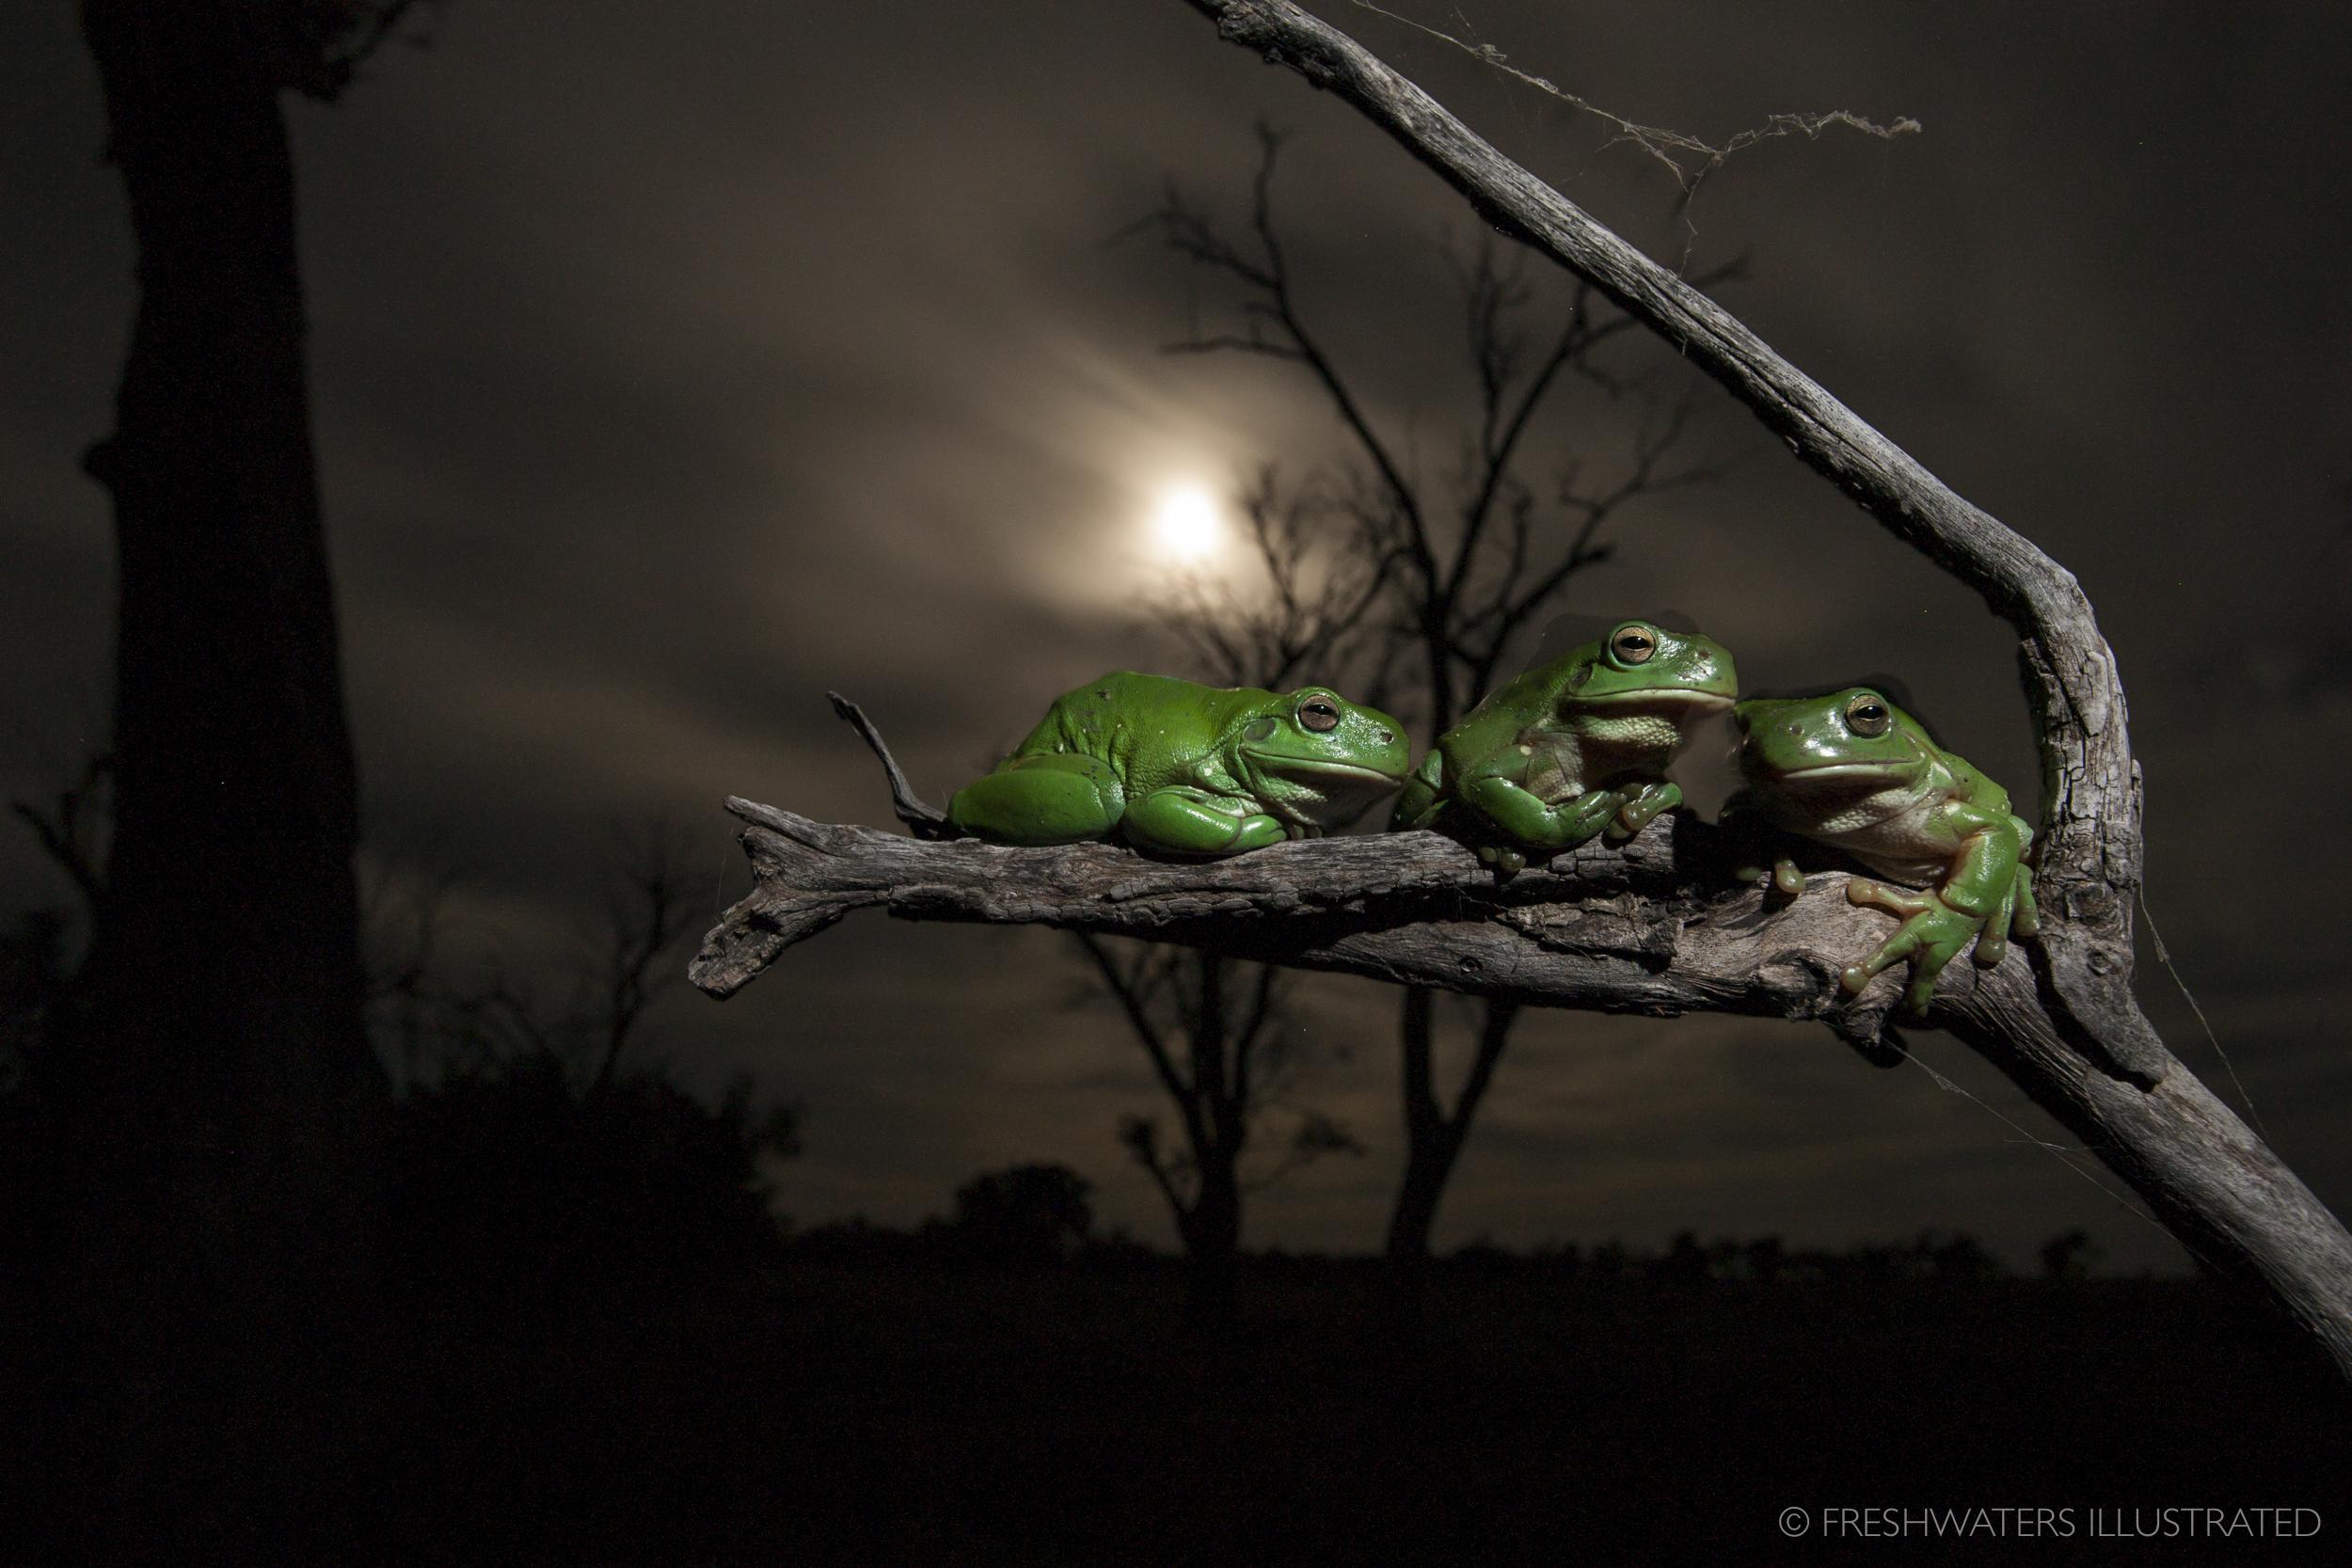 Green tree frogs (Litoria caerulea) Macquarie Marshes, Australia